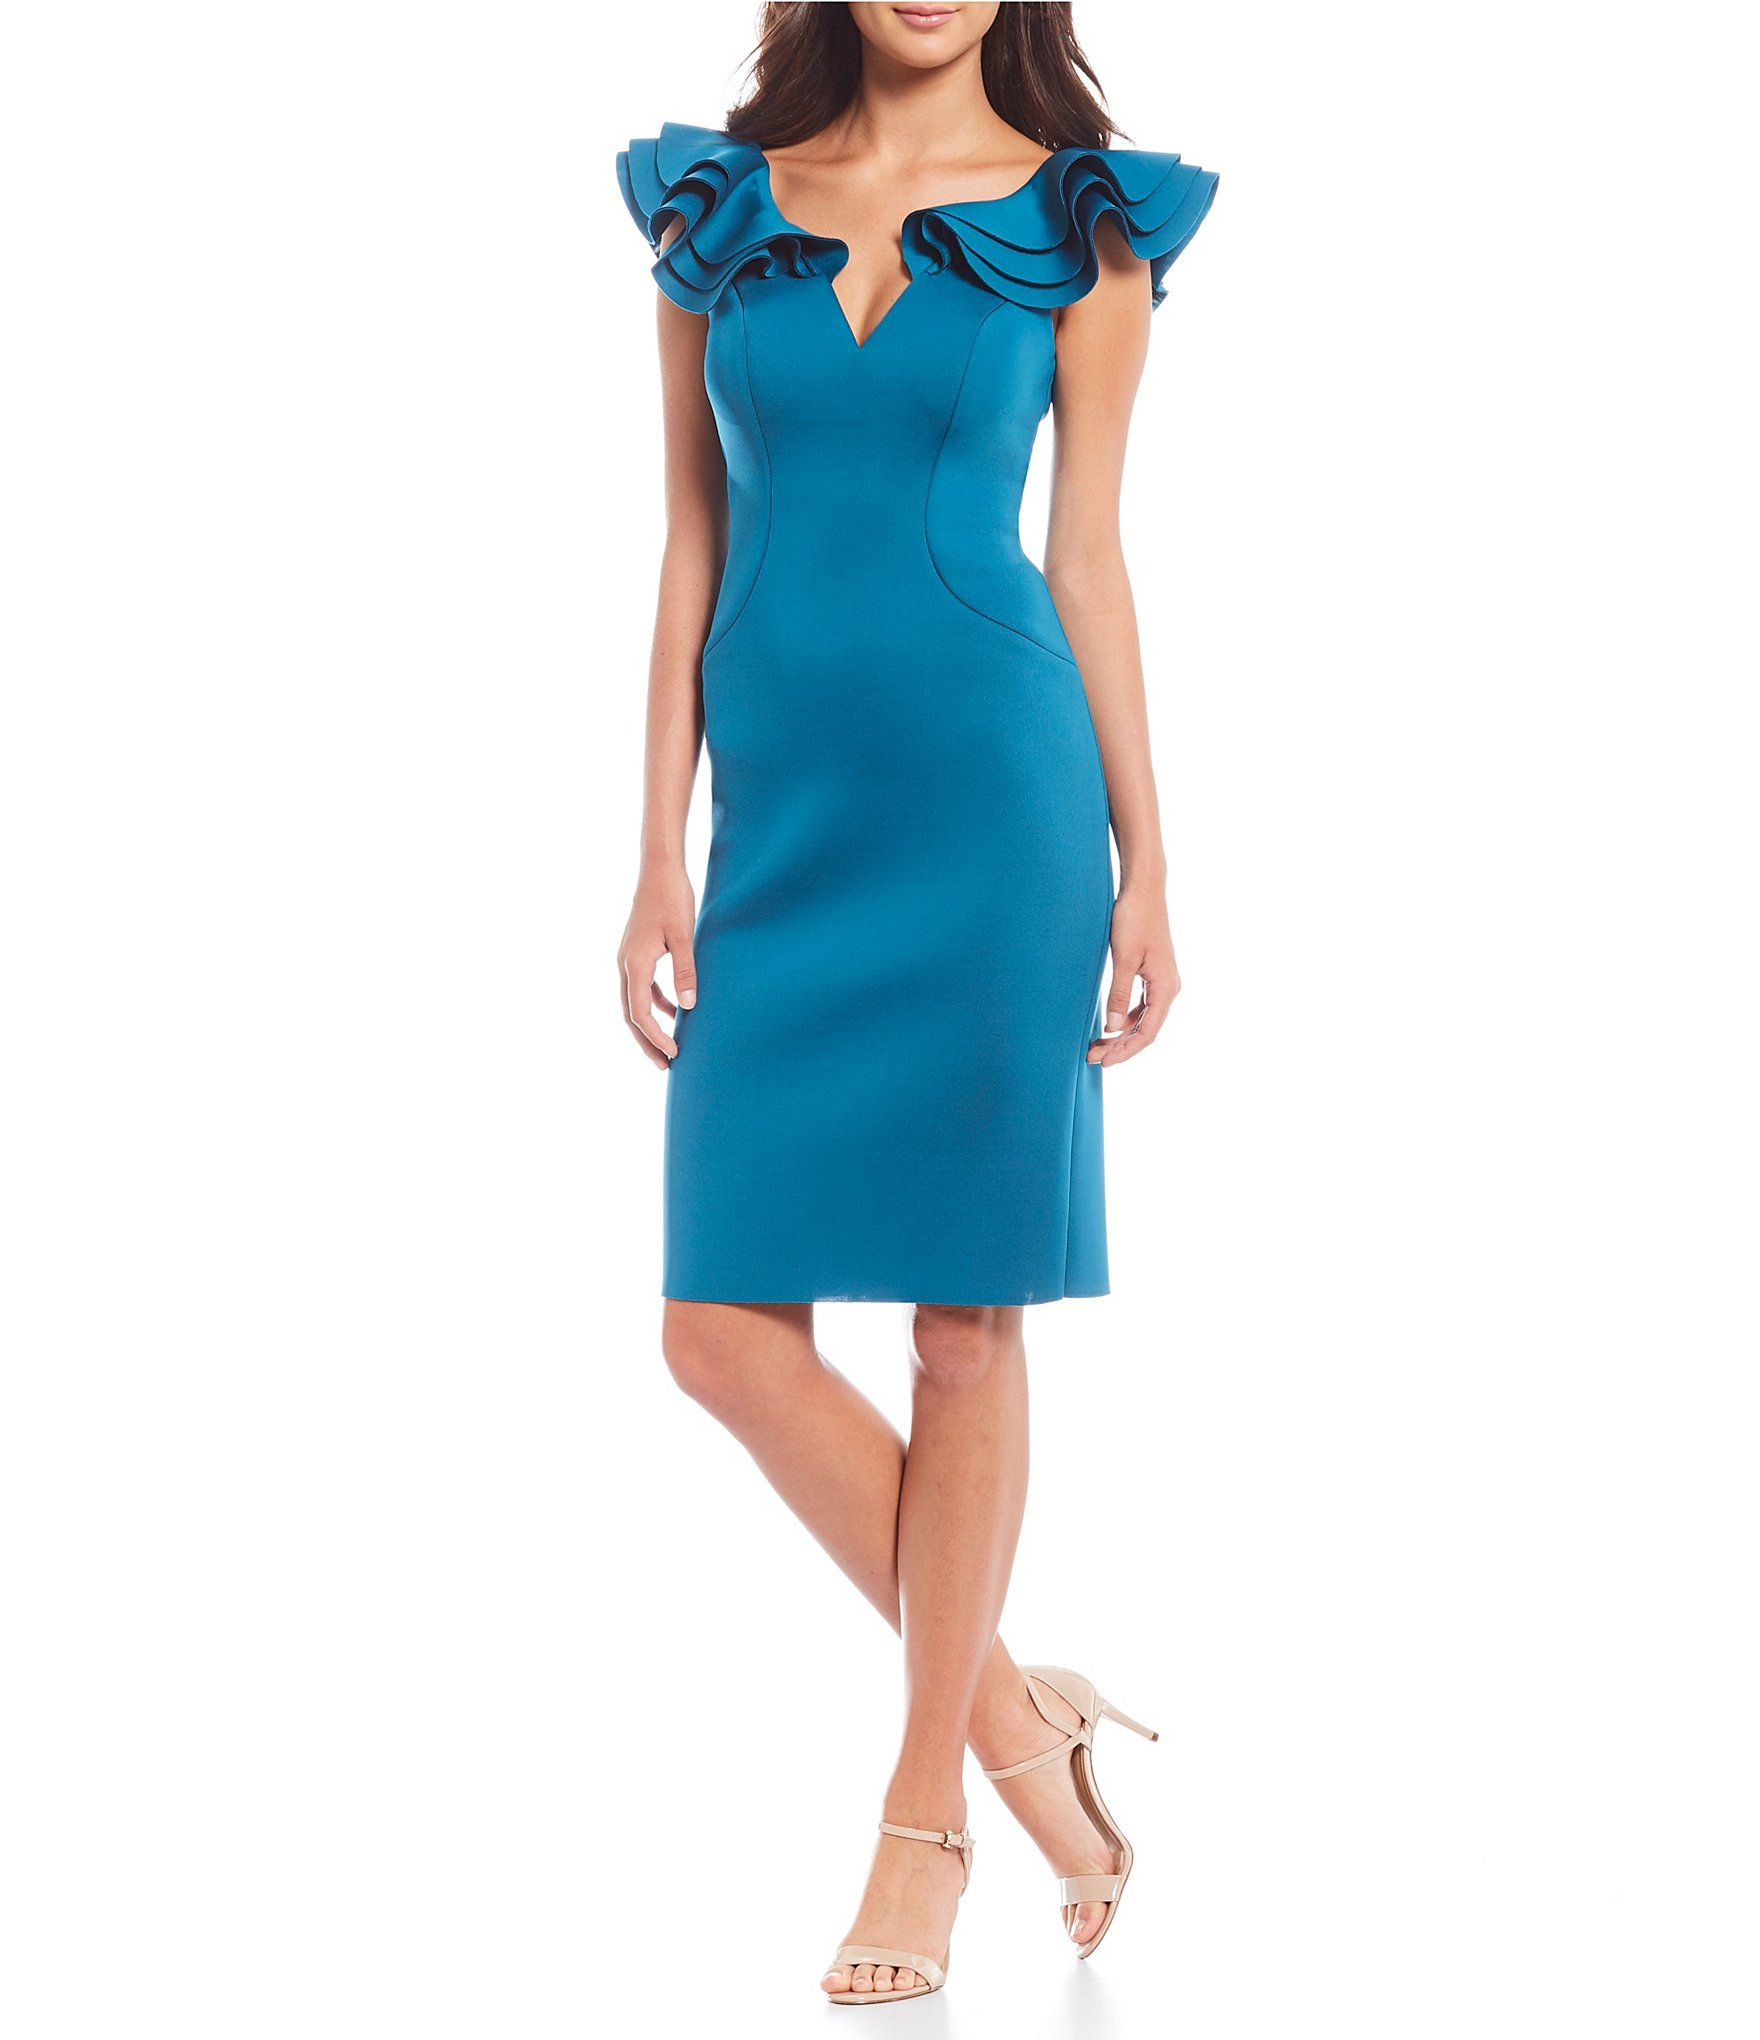 Eliza J Ruffle Sleeve Plunge Neck Scuba Sheath Dress Dillards Guest Attire Wedding Attire Guest Casual Wedding Guest Dresses [ 2040 x 1760 Pixel ]